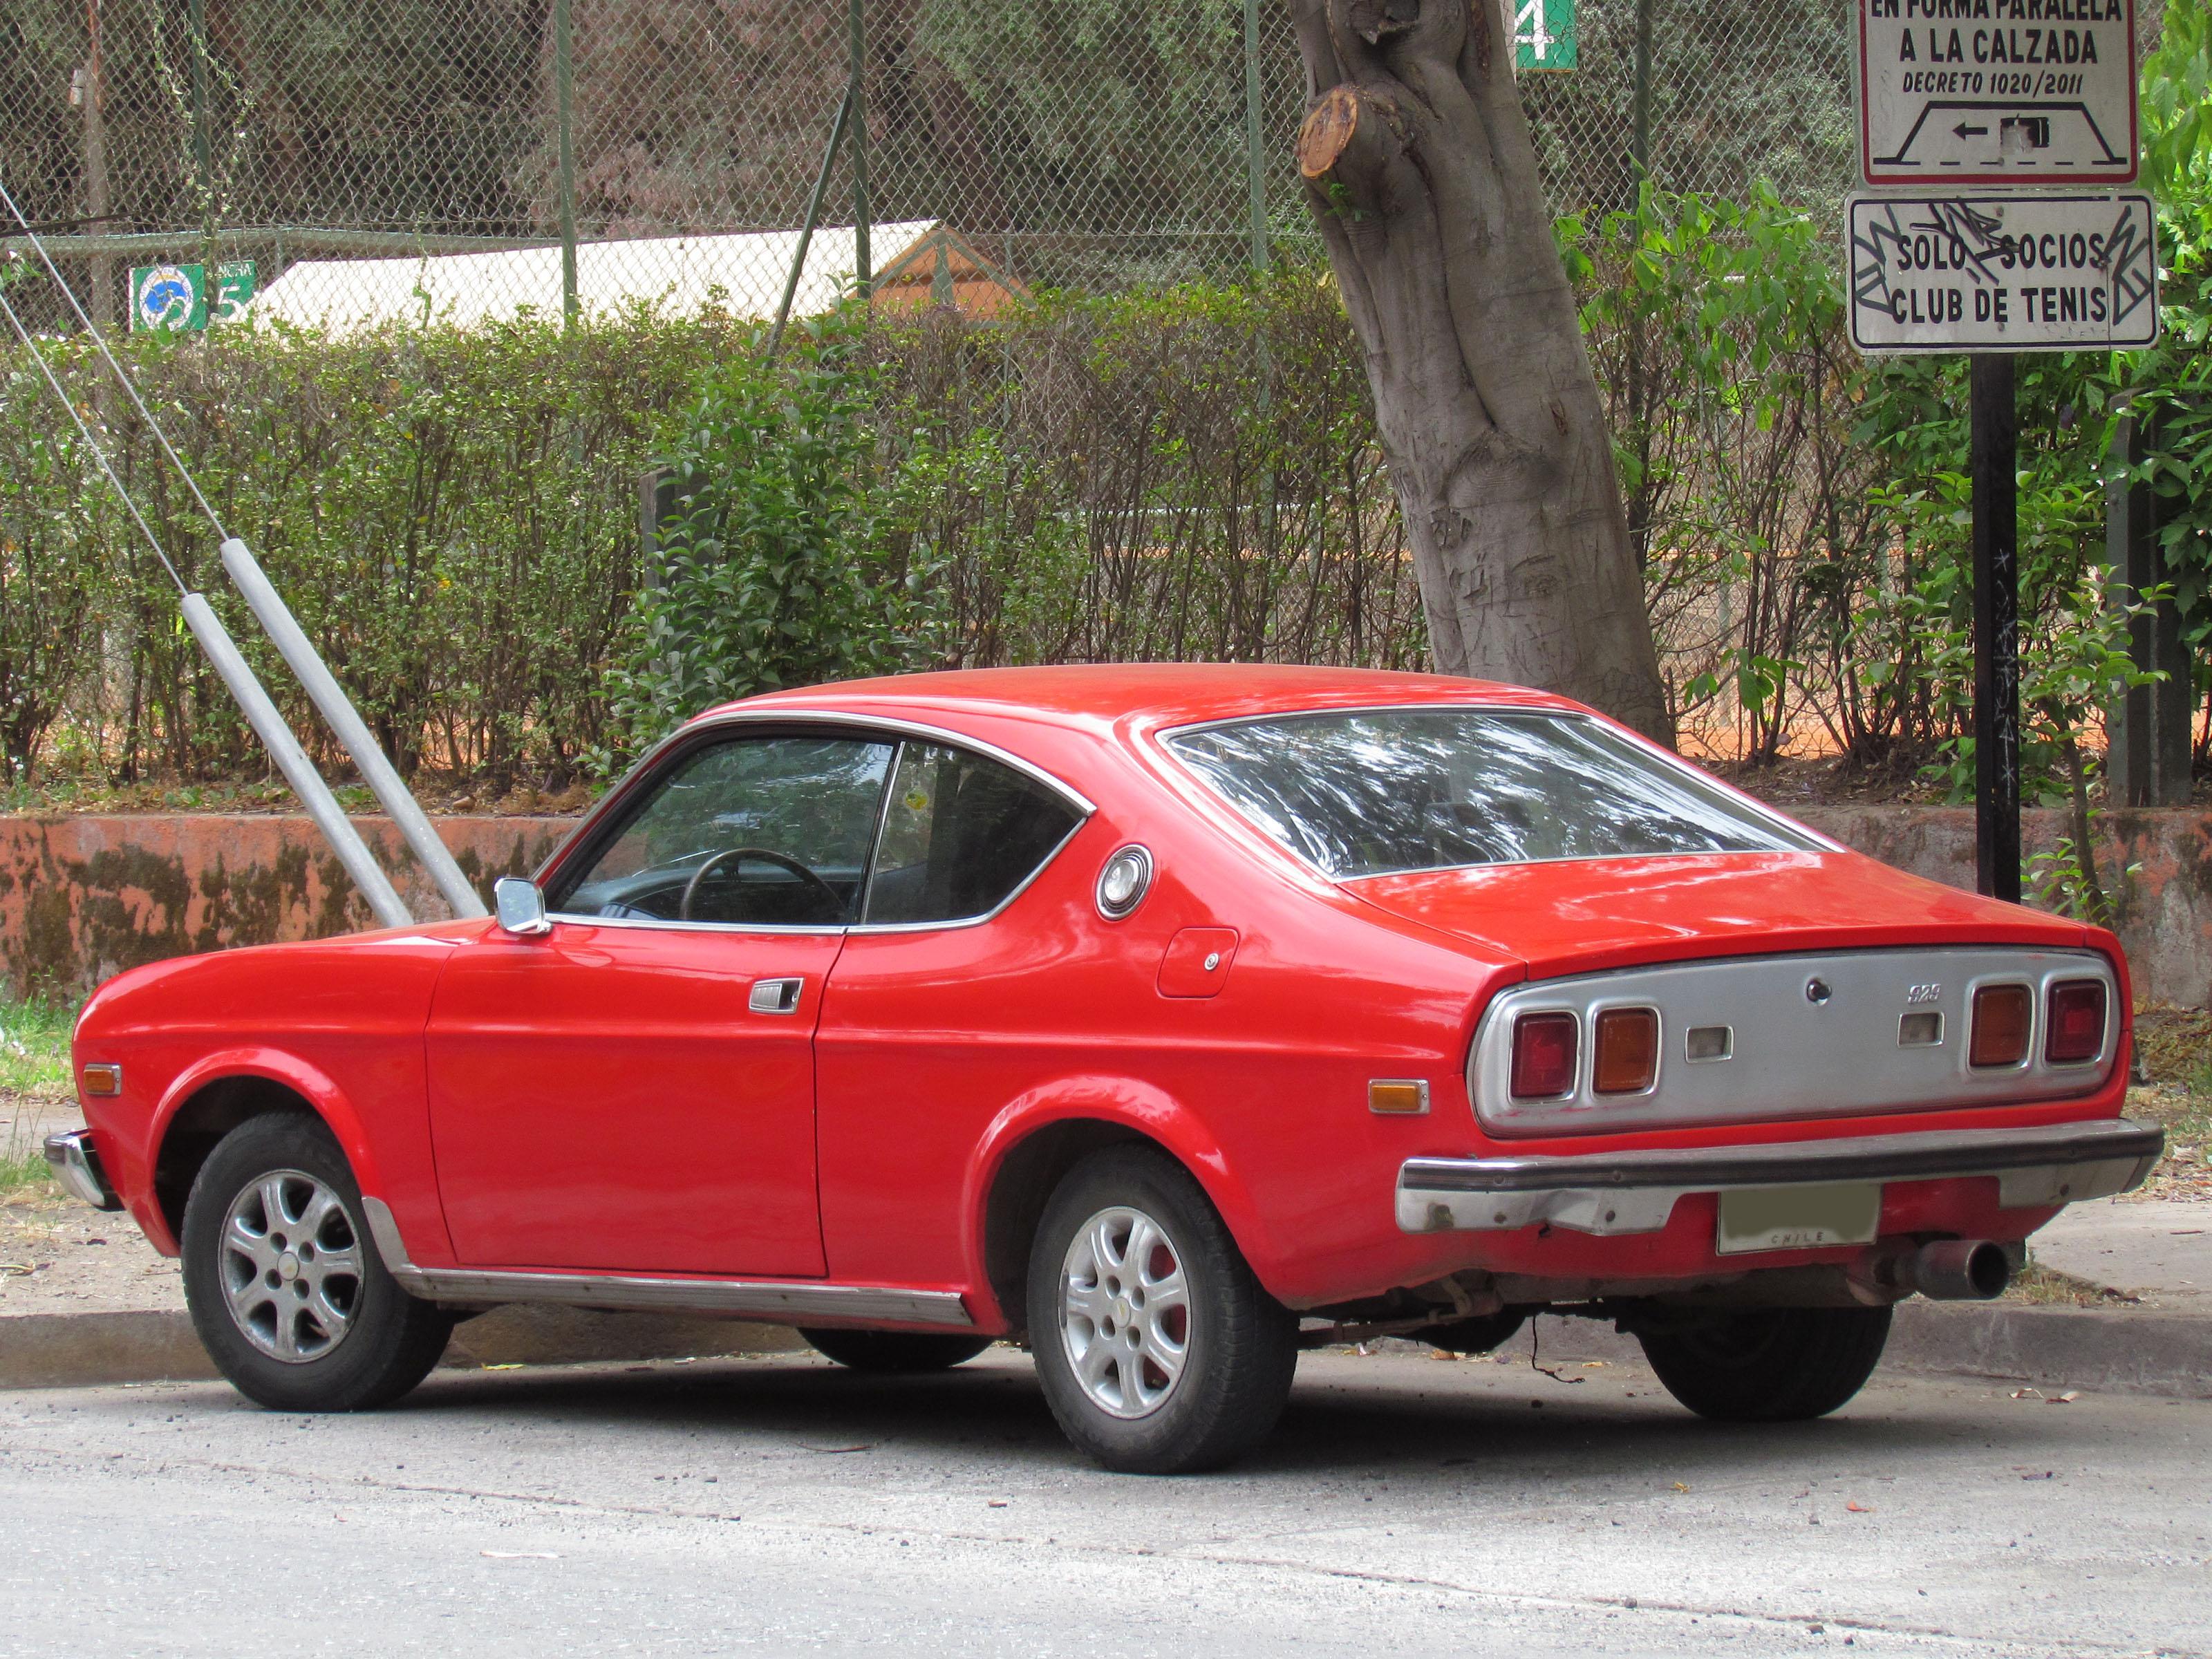 Build Your Mazda >> File:Mazda 929 Hardtop Coupe 1976 (11317464073).jpg - Wikimedia Commons